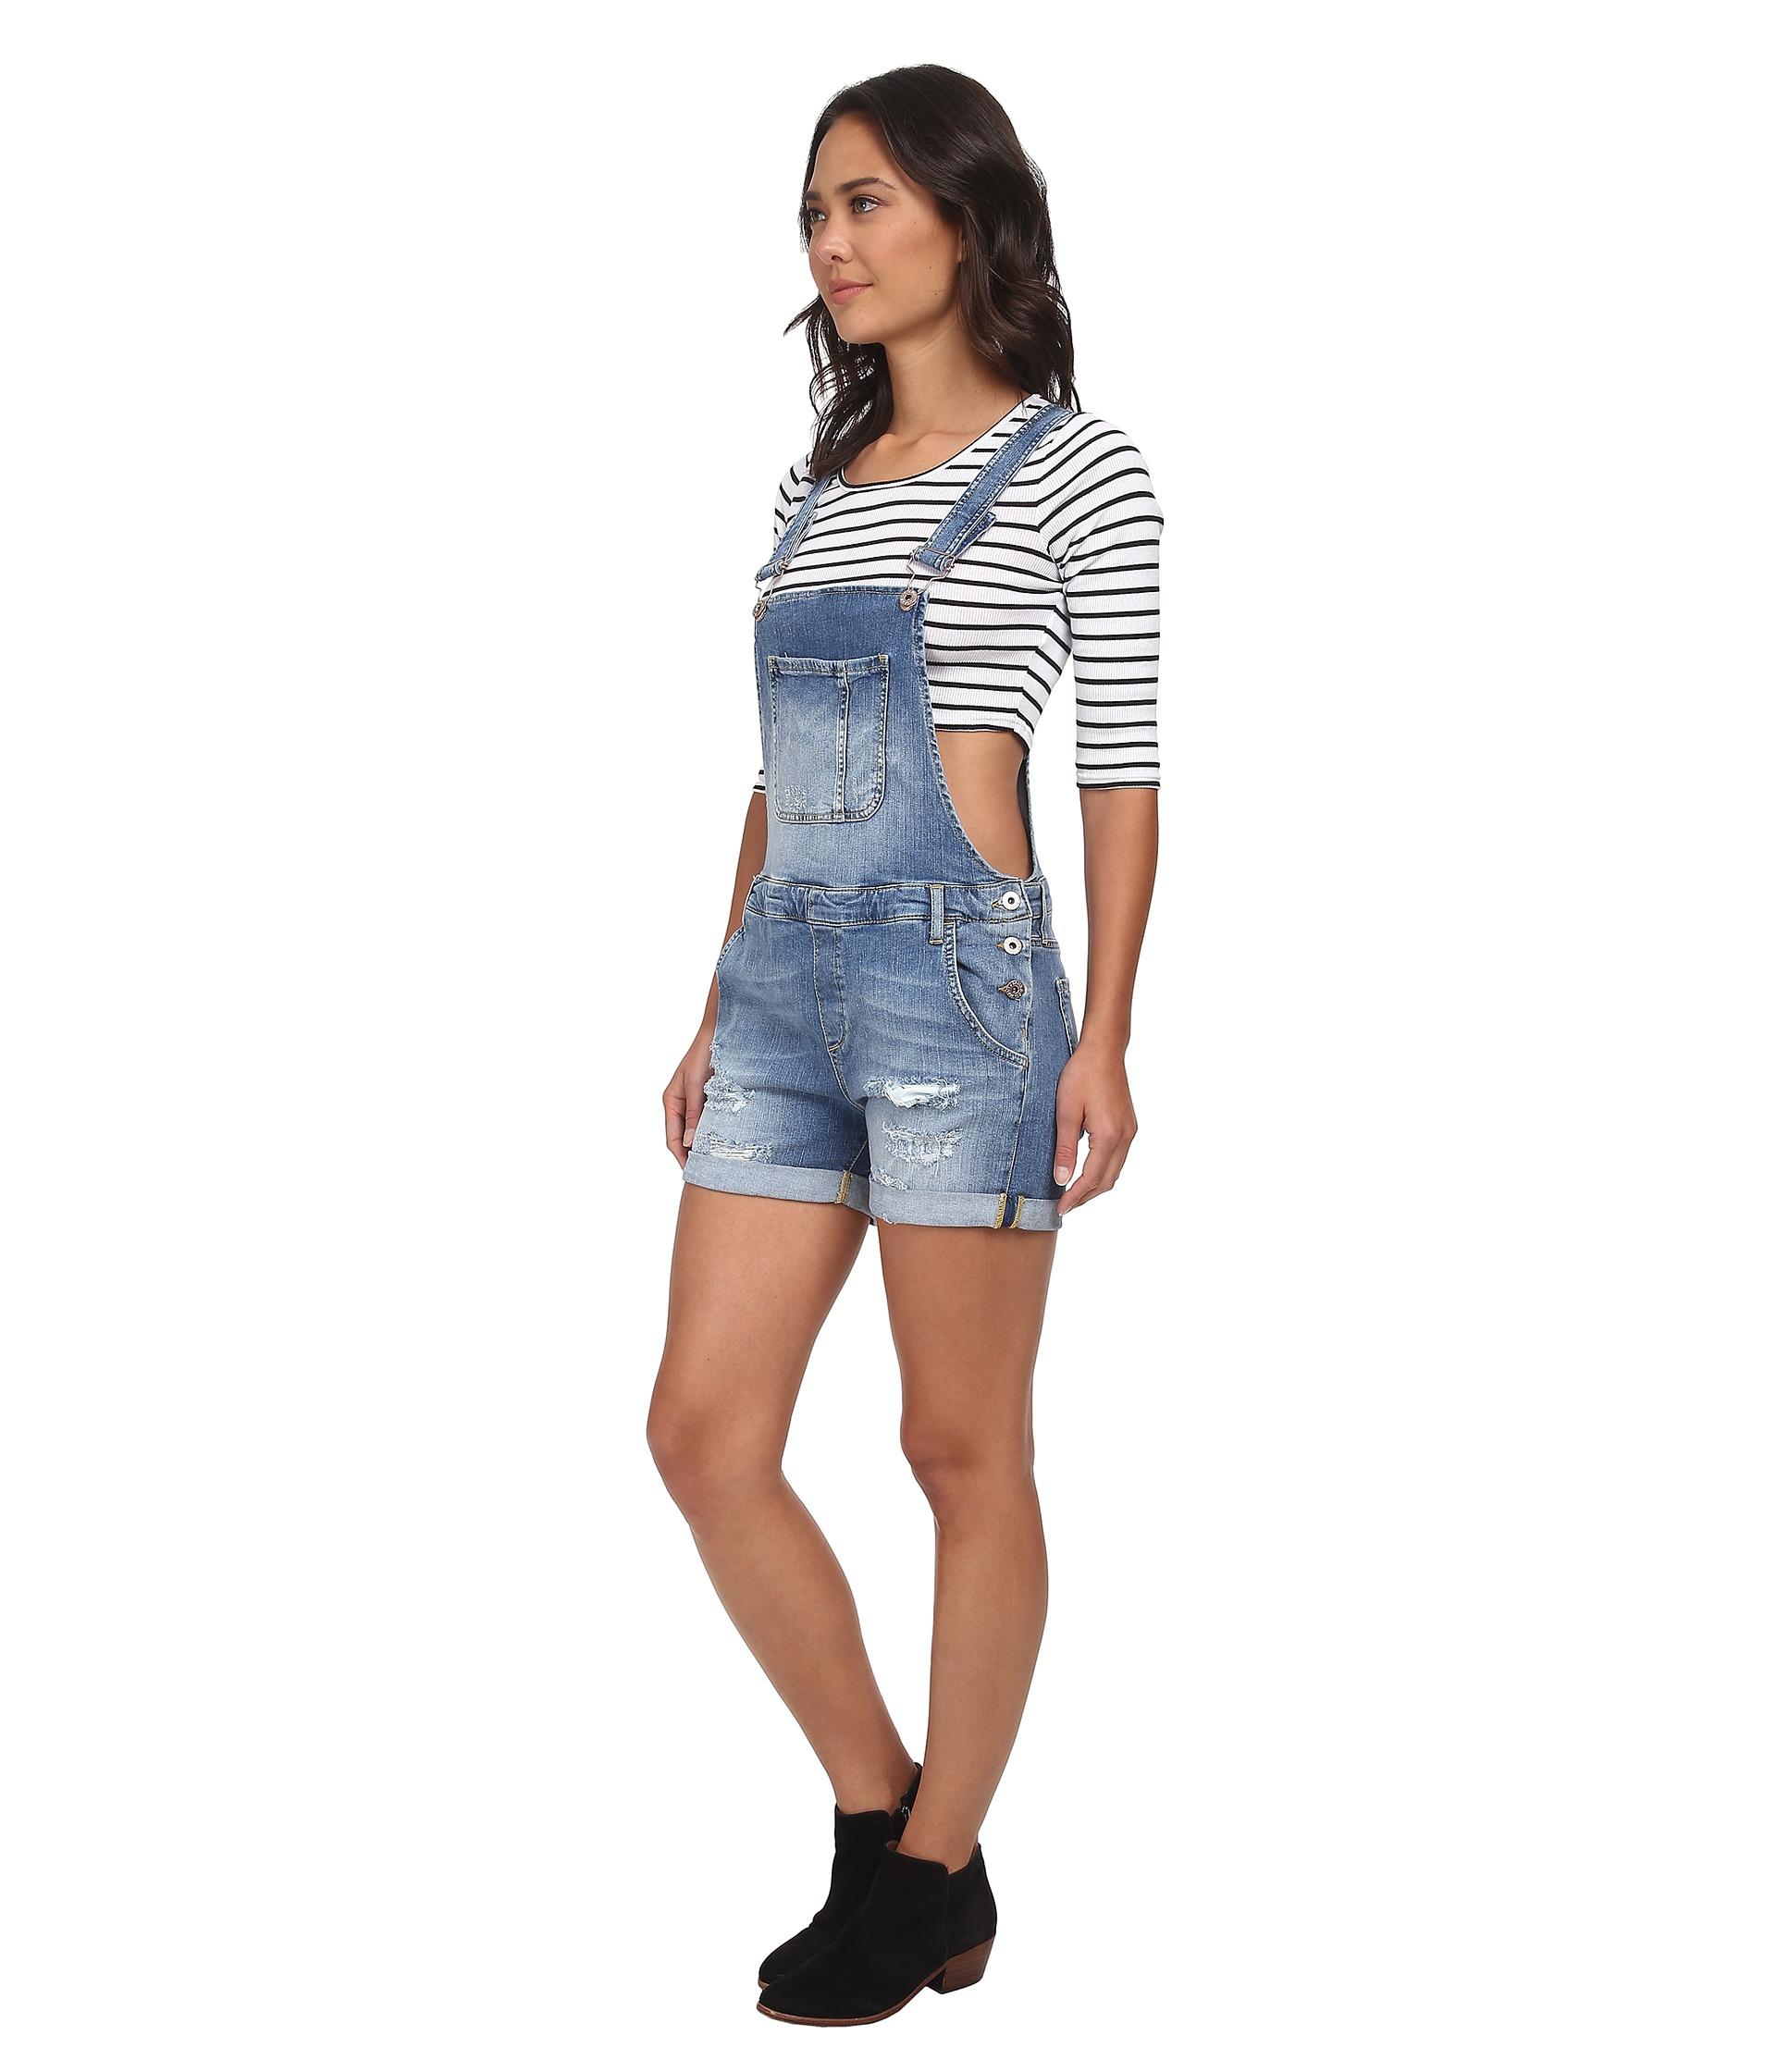 012f1b2af641 Lyst - Mavi Jeans Wanda Denim Shortall In Light Used Vintage in Blue